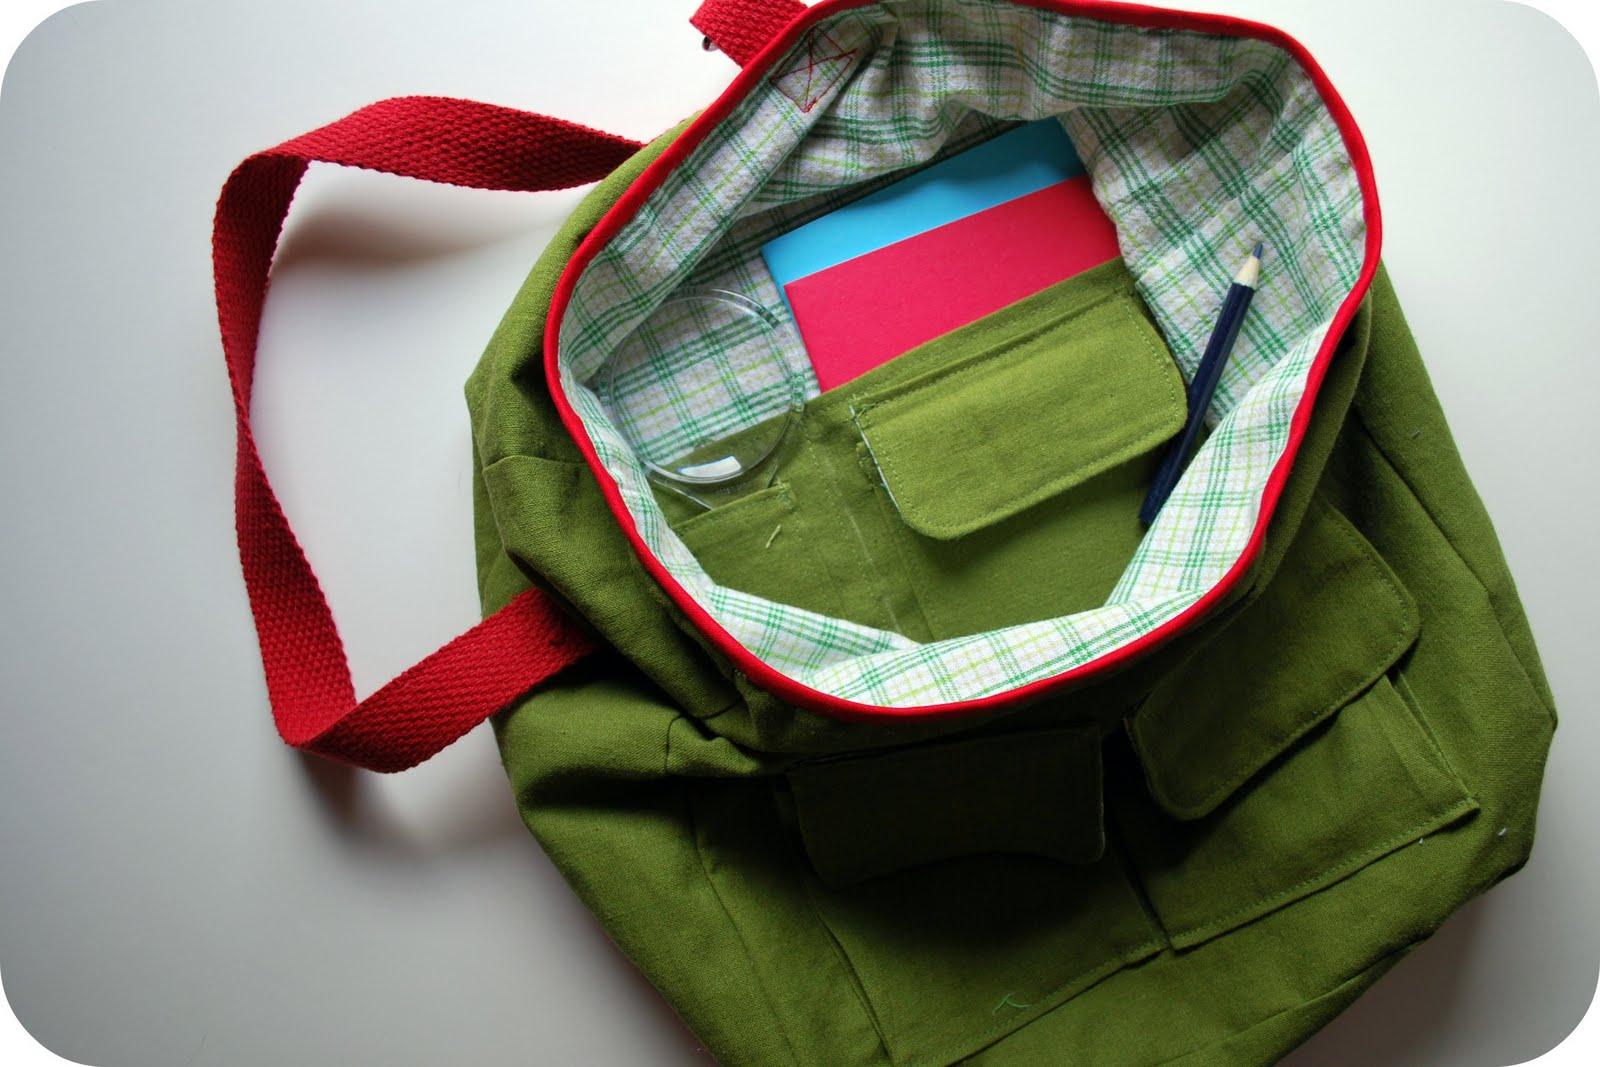 http://3.bp.blogspot.com/-Z-d-OKAHsC8/TglO3TSj4KI/AAAAAAAAFgo/BJYhJ5fTYmU/s1600/Nature+Explorer+Bag+Interior+Pockets.jpg